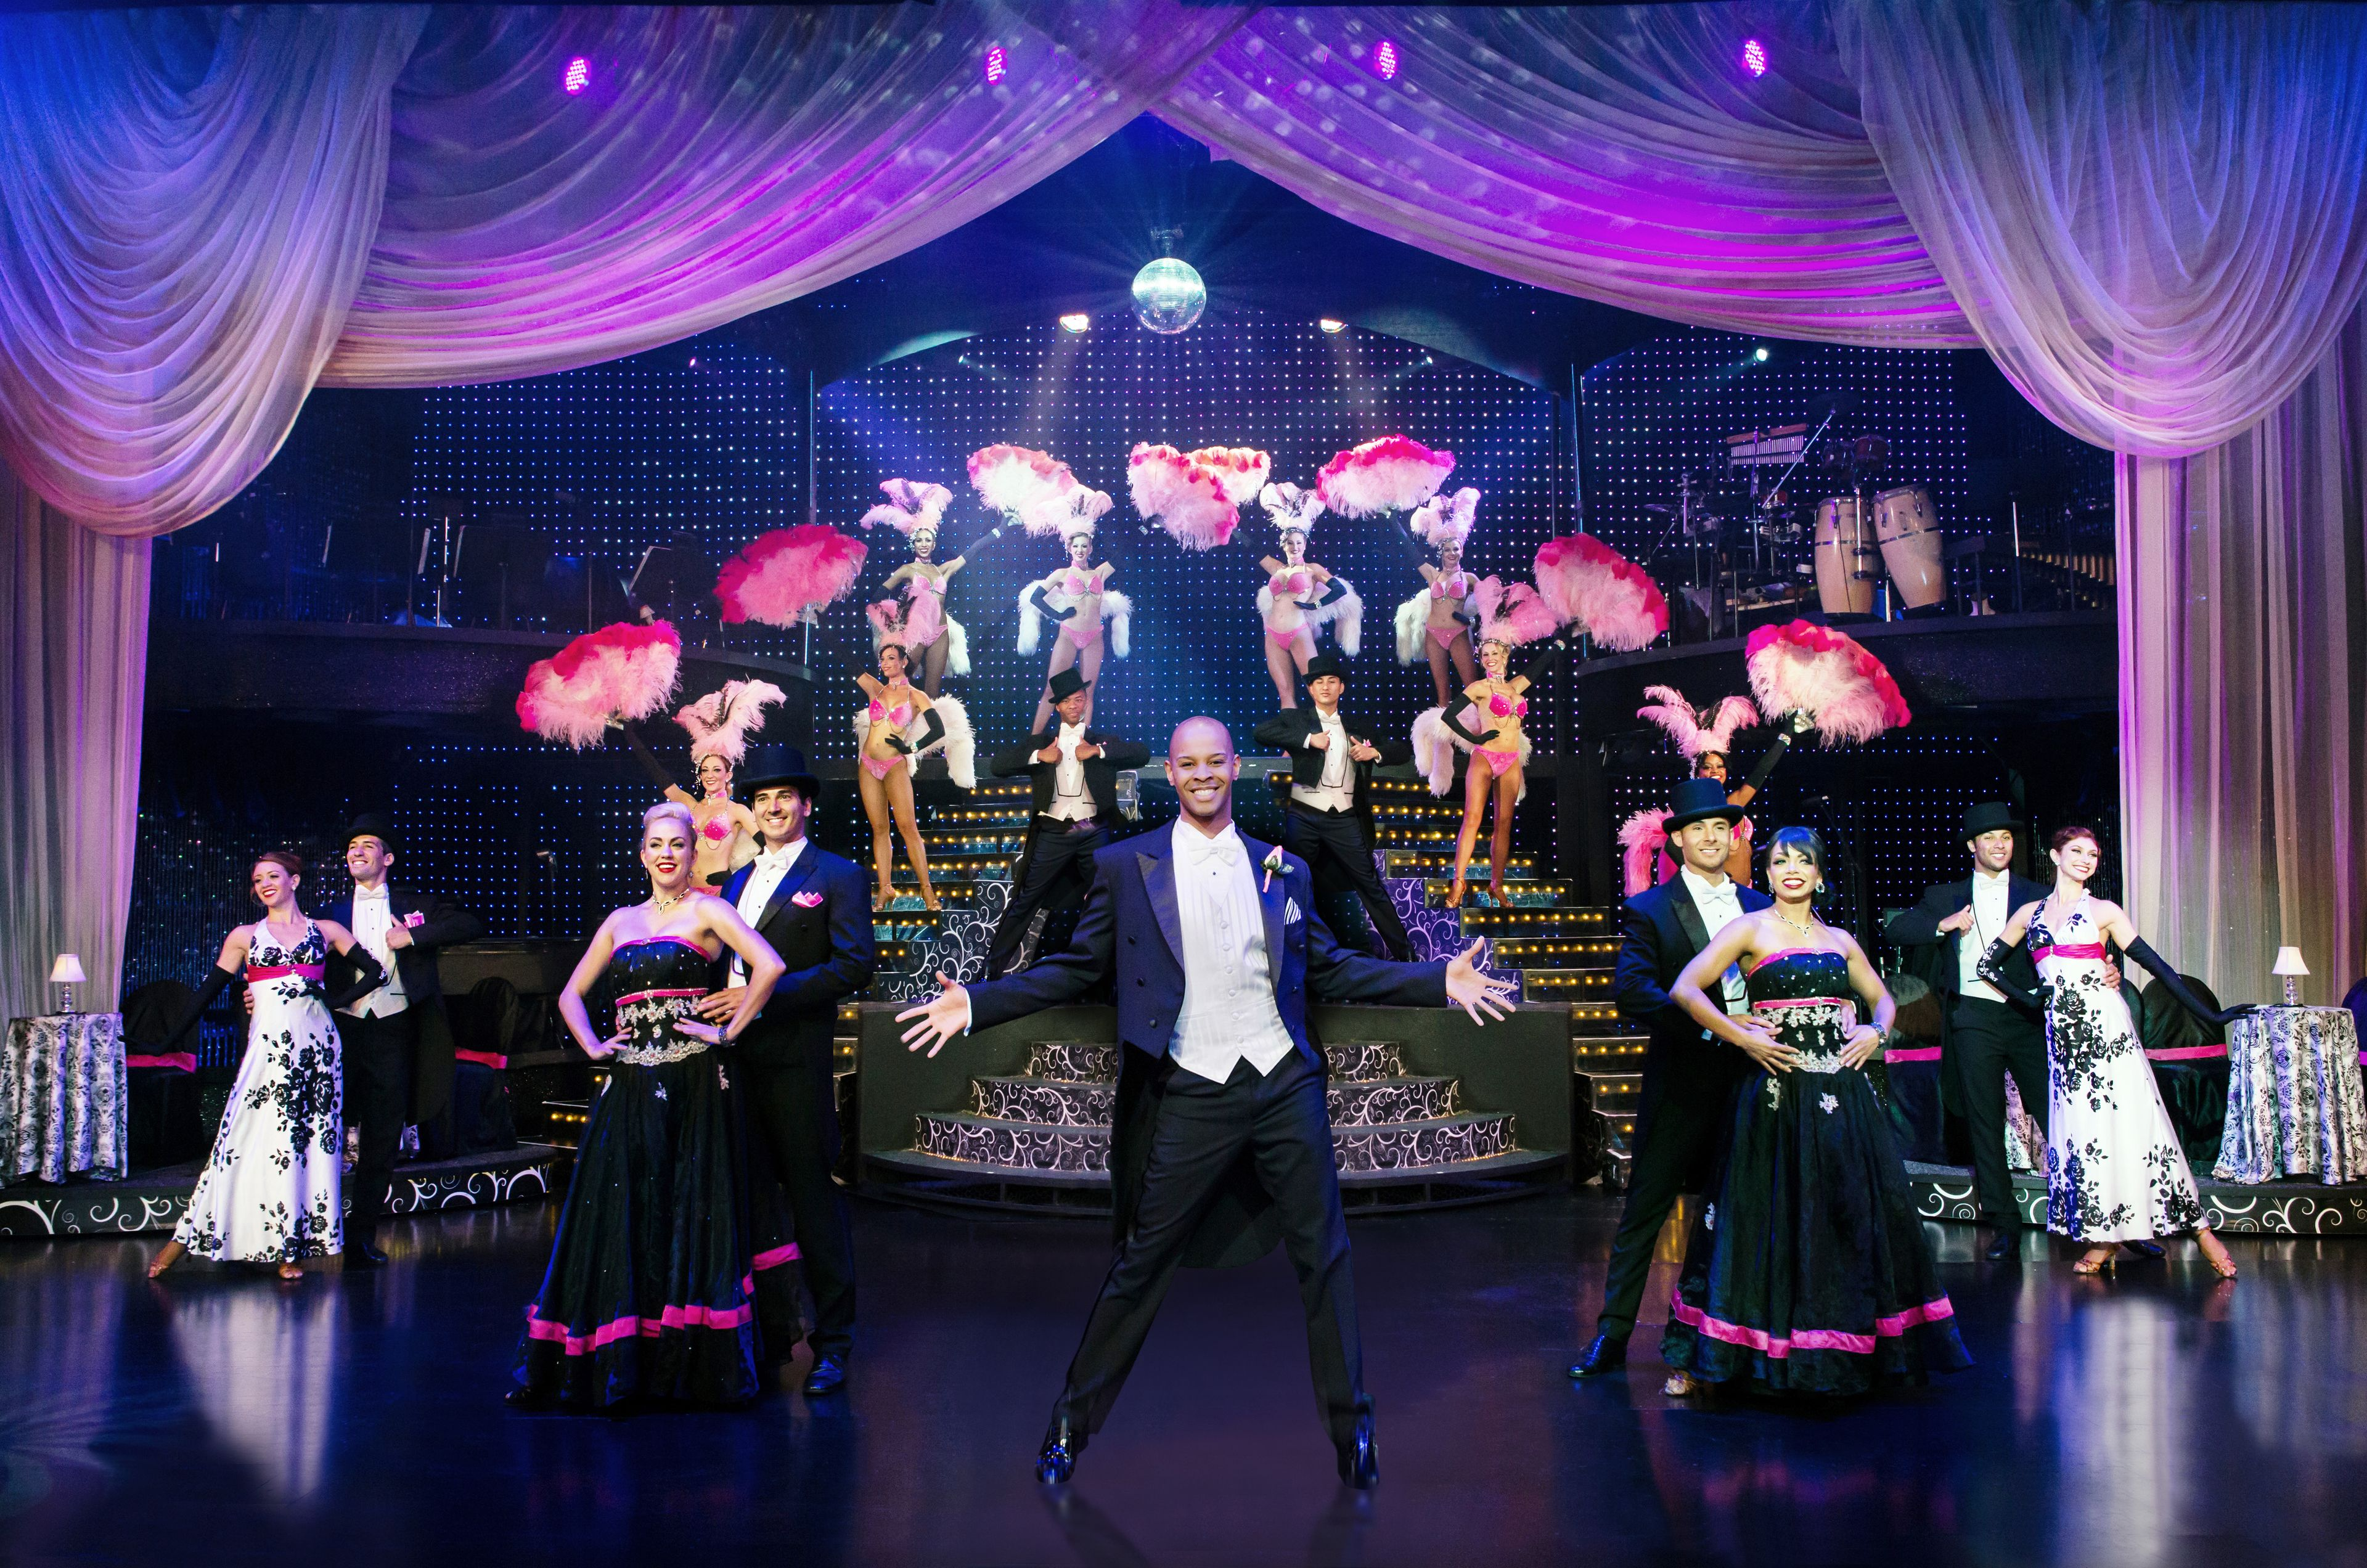 Vegas_The_Show_04.jpg